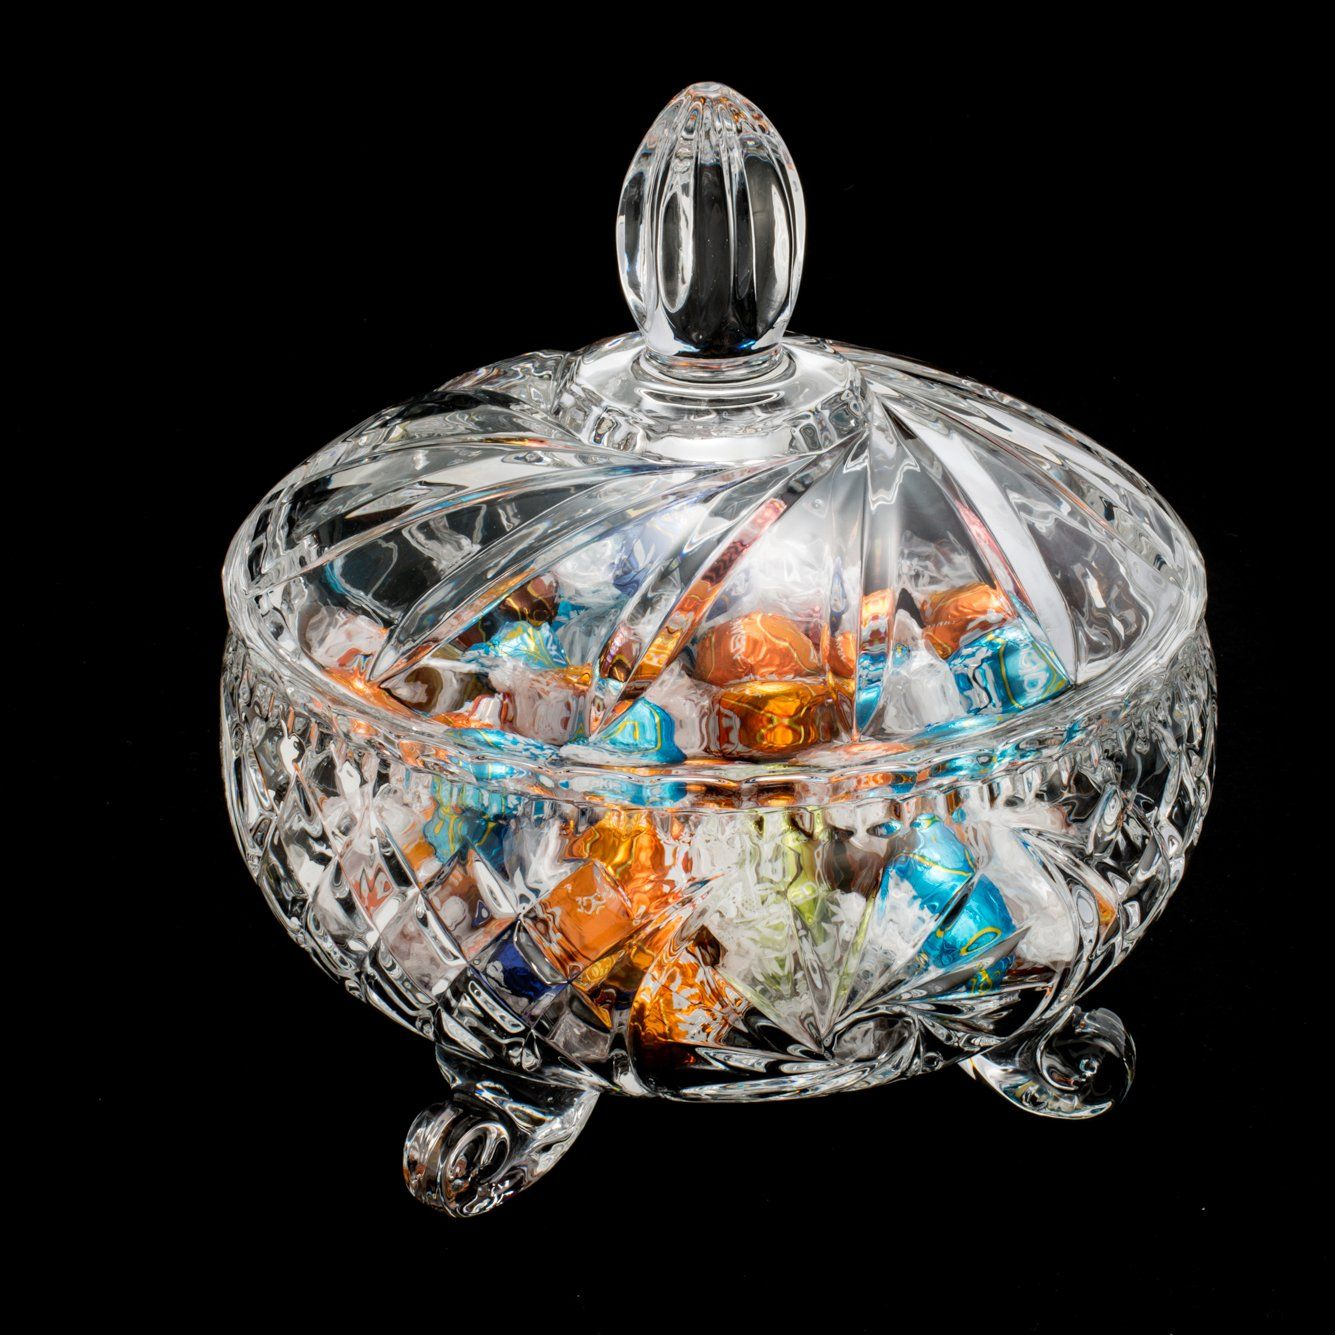 Bomboniere 18 cm de cristal transparente com tampa Sunflower Wolff - 2707